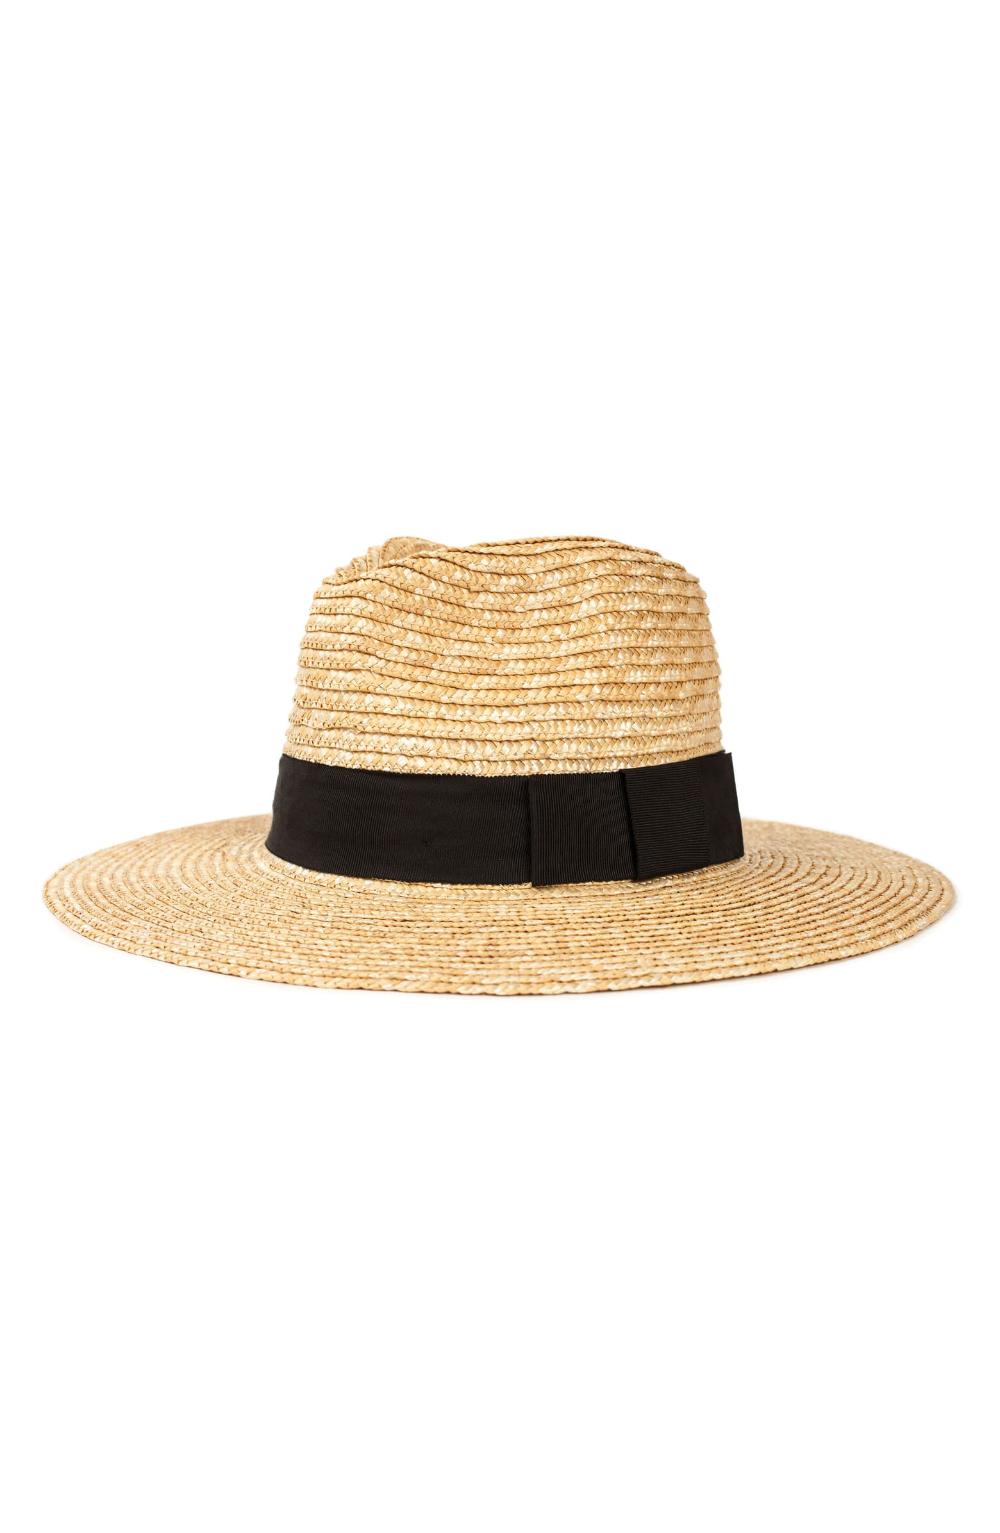 Brixton Joanna Straw Hat Nordstrom Straw Hat Resort Wear Sun Hats